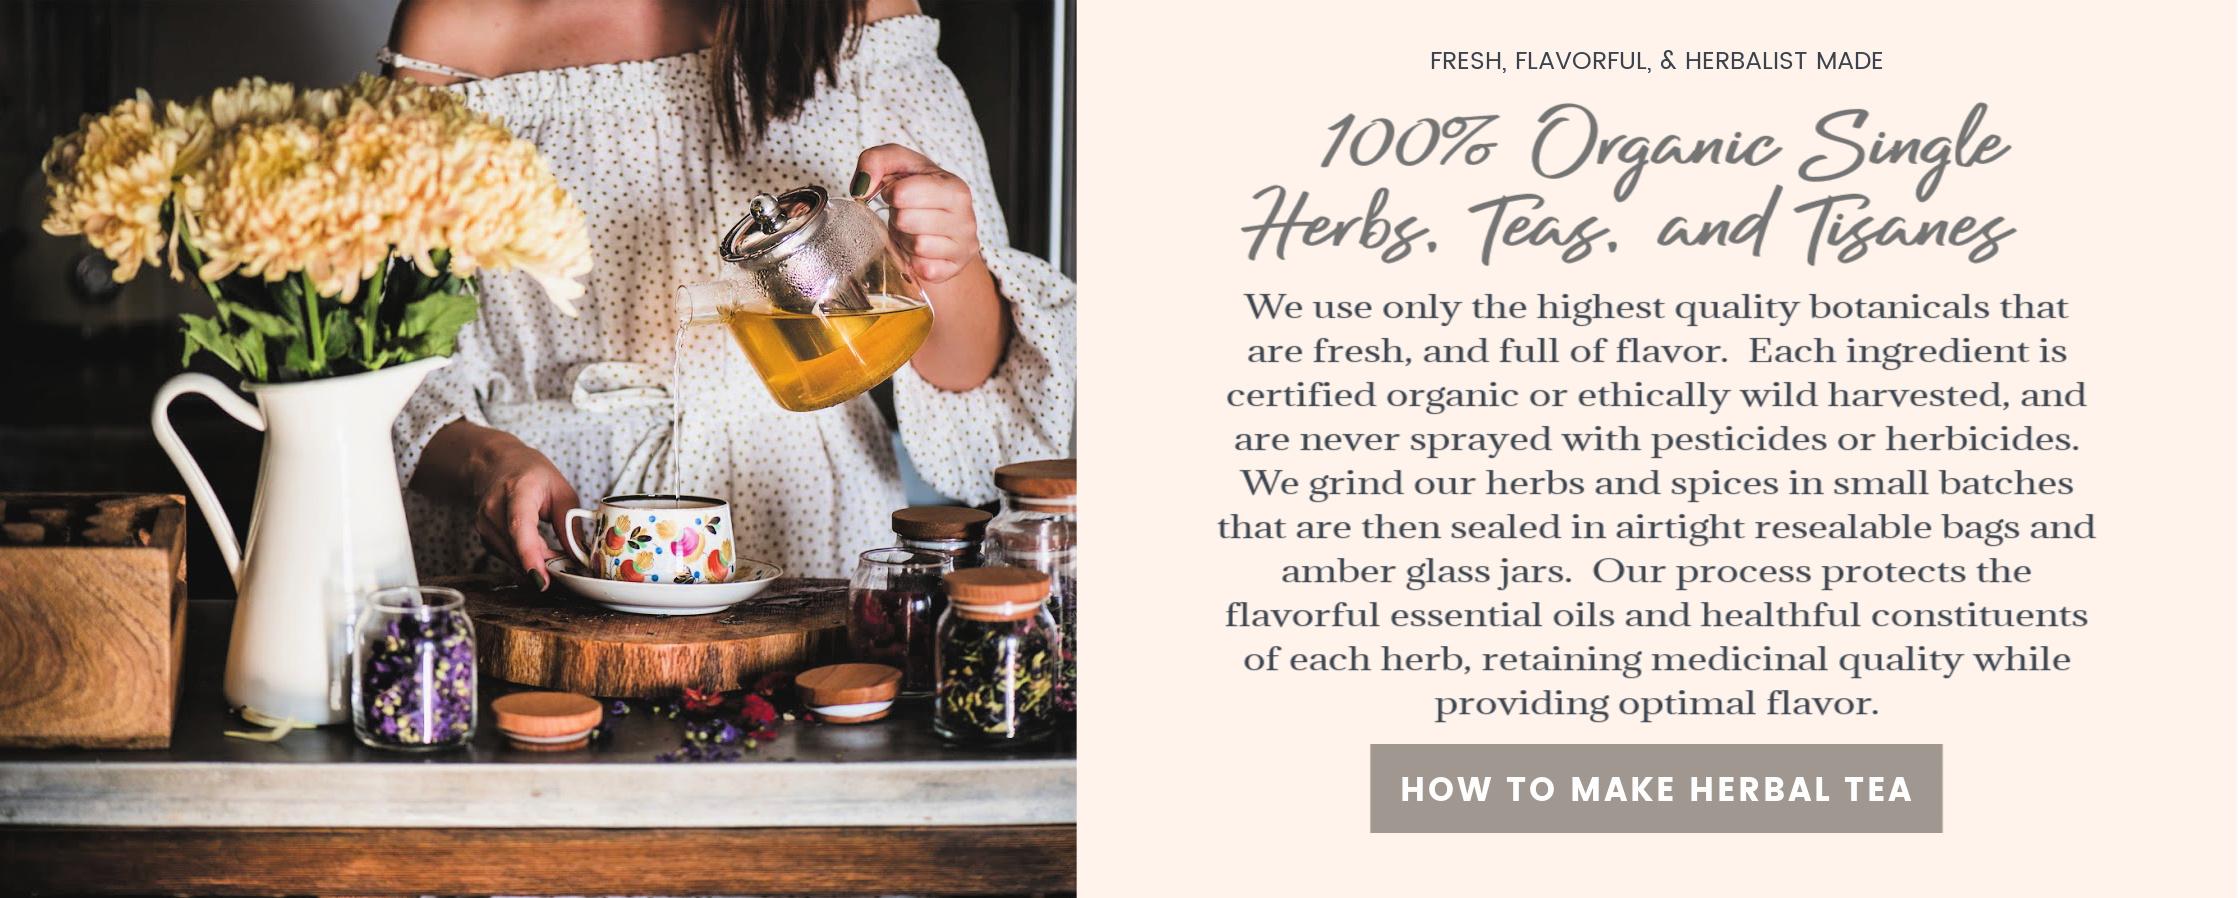 1-tht-herbs-teas-and-tisanes-guarantee.jpg